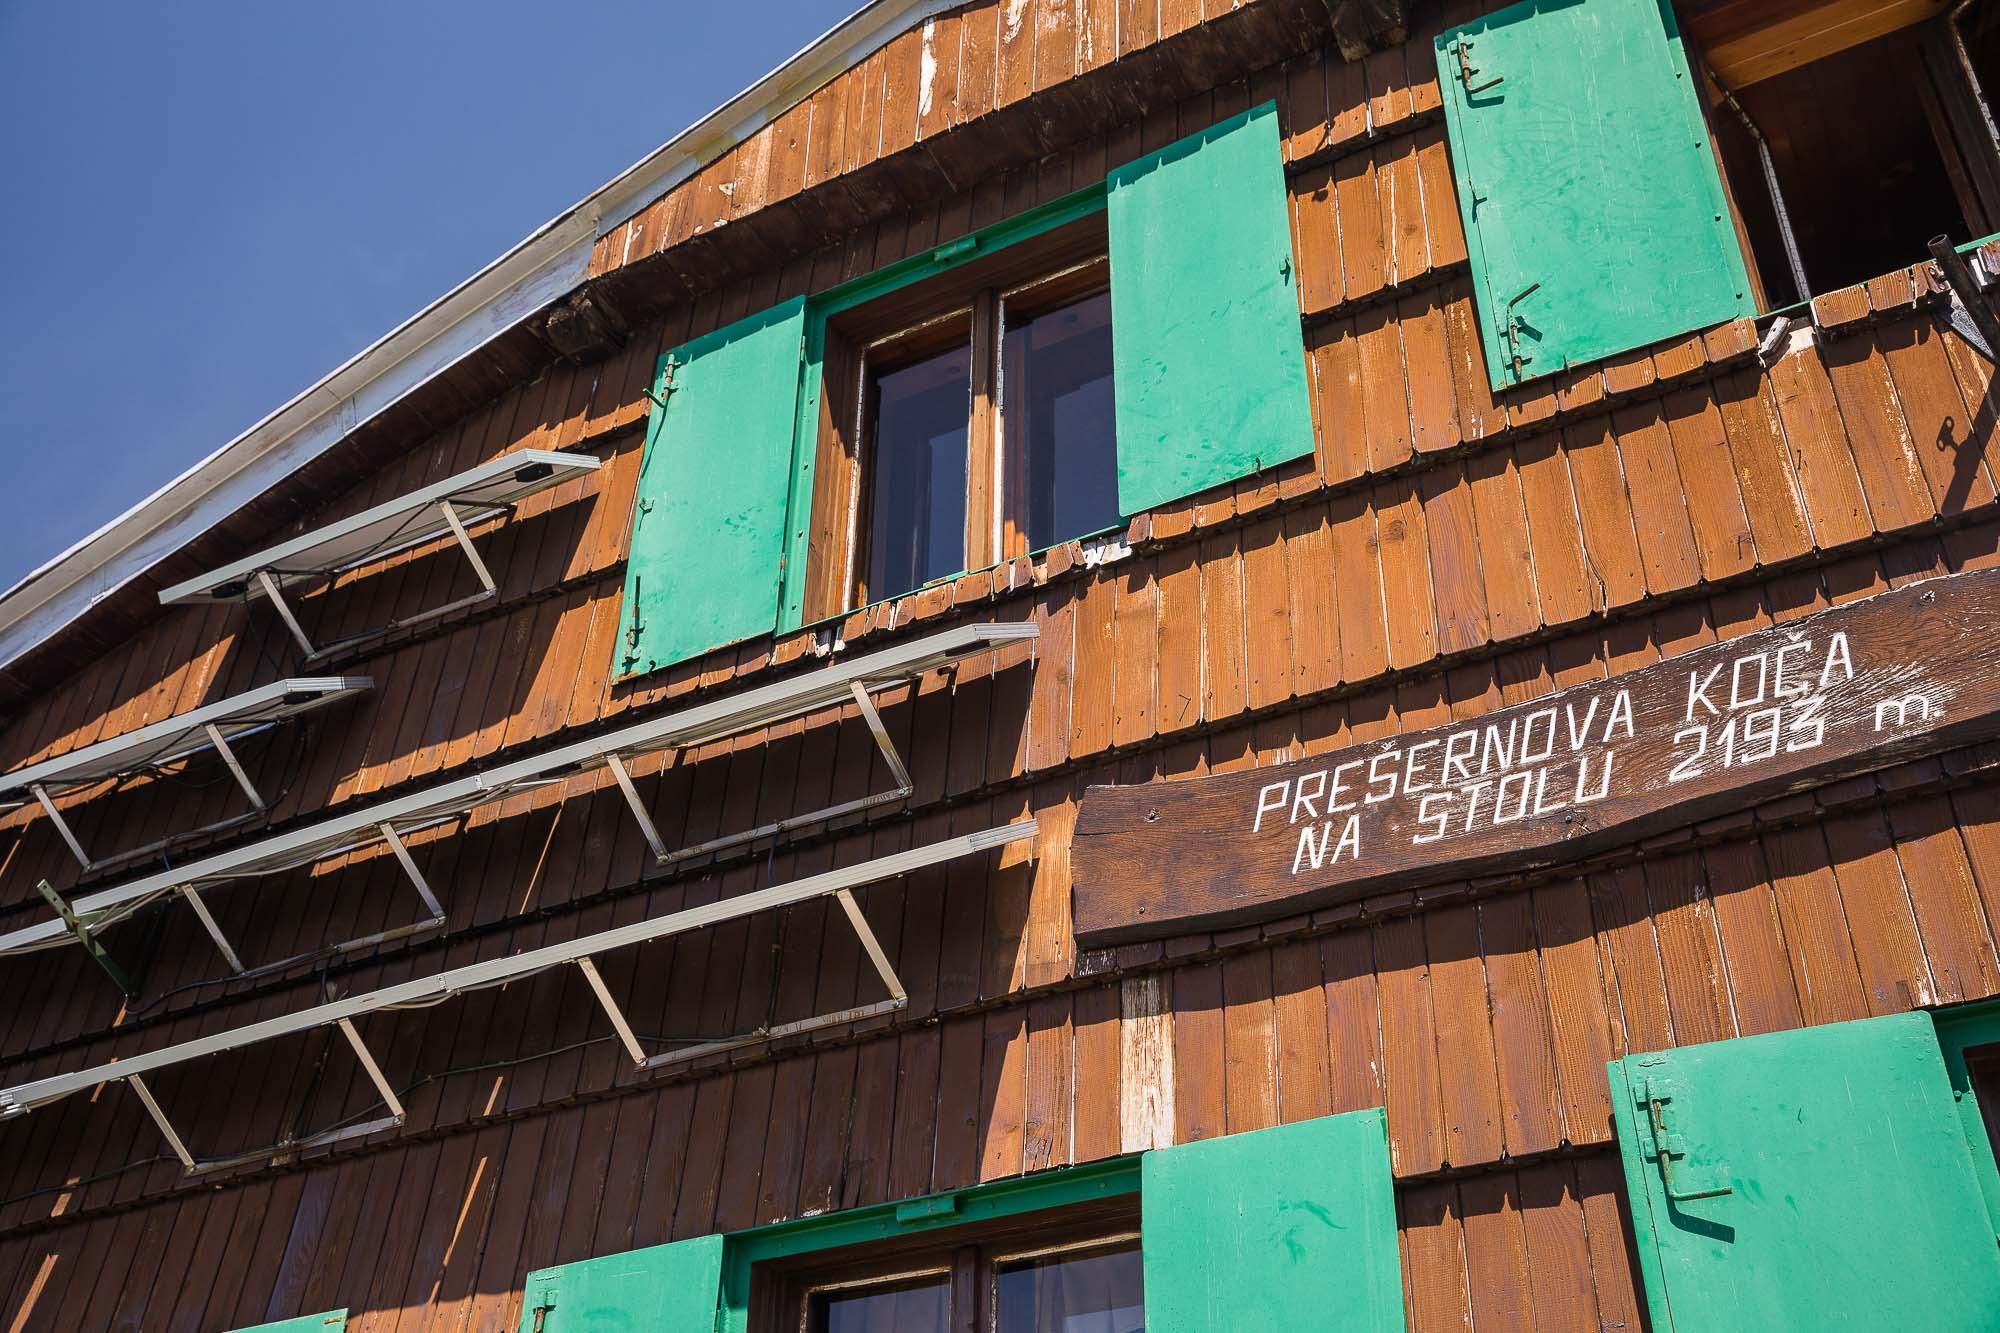 Stol 2236m - www.jusmedic.com